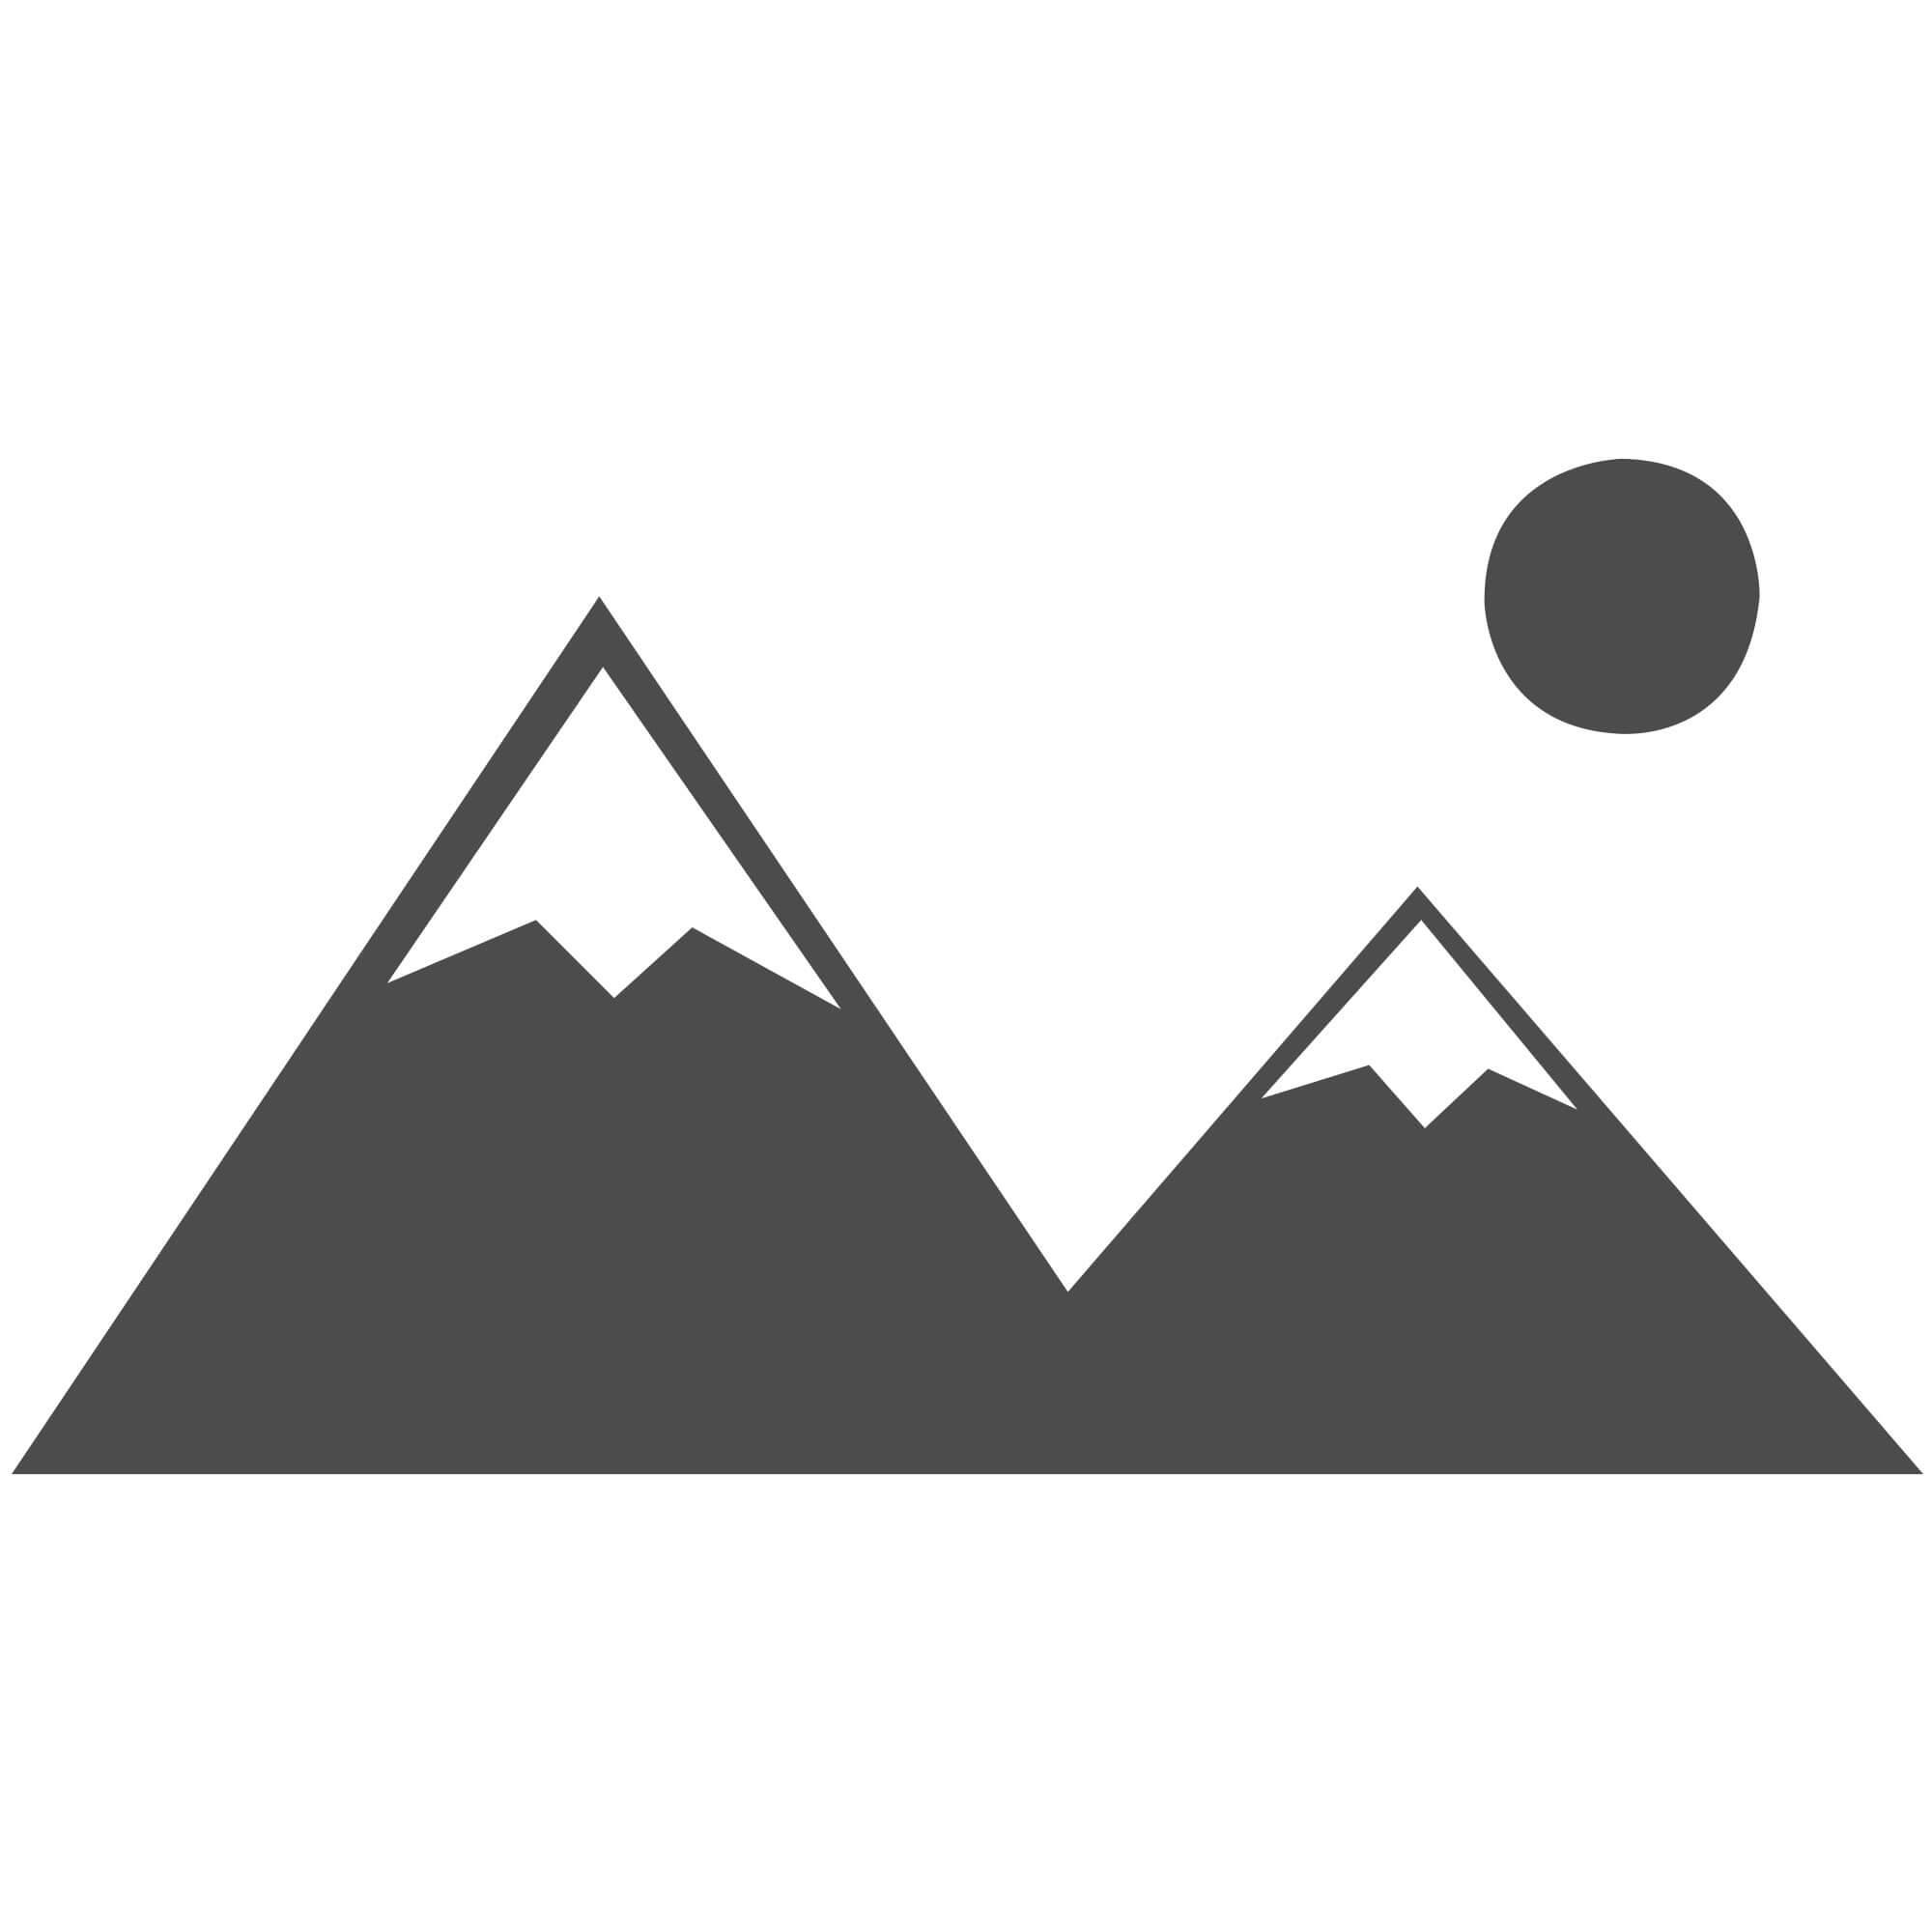 Celtic Fireworks - Celestial Conquest